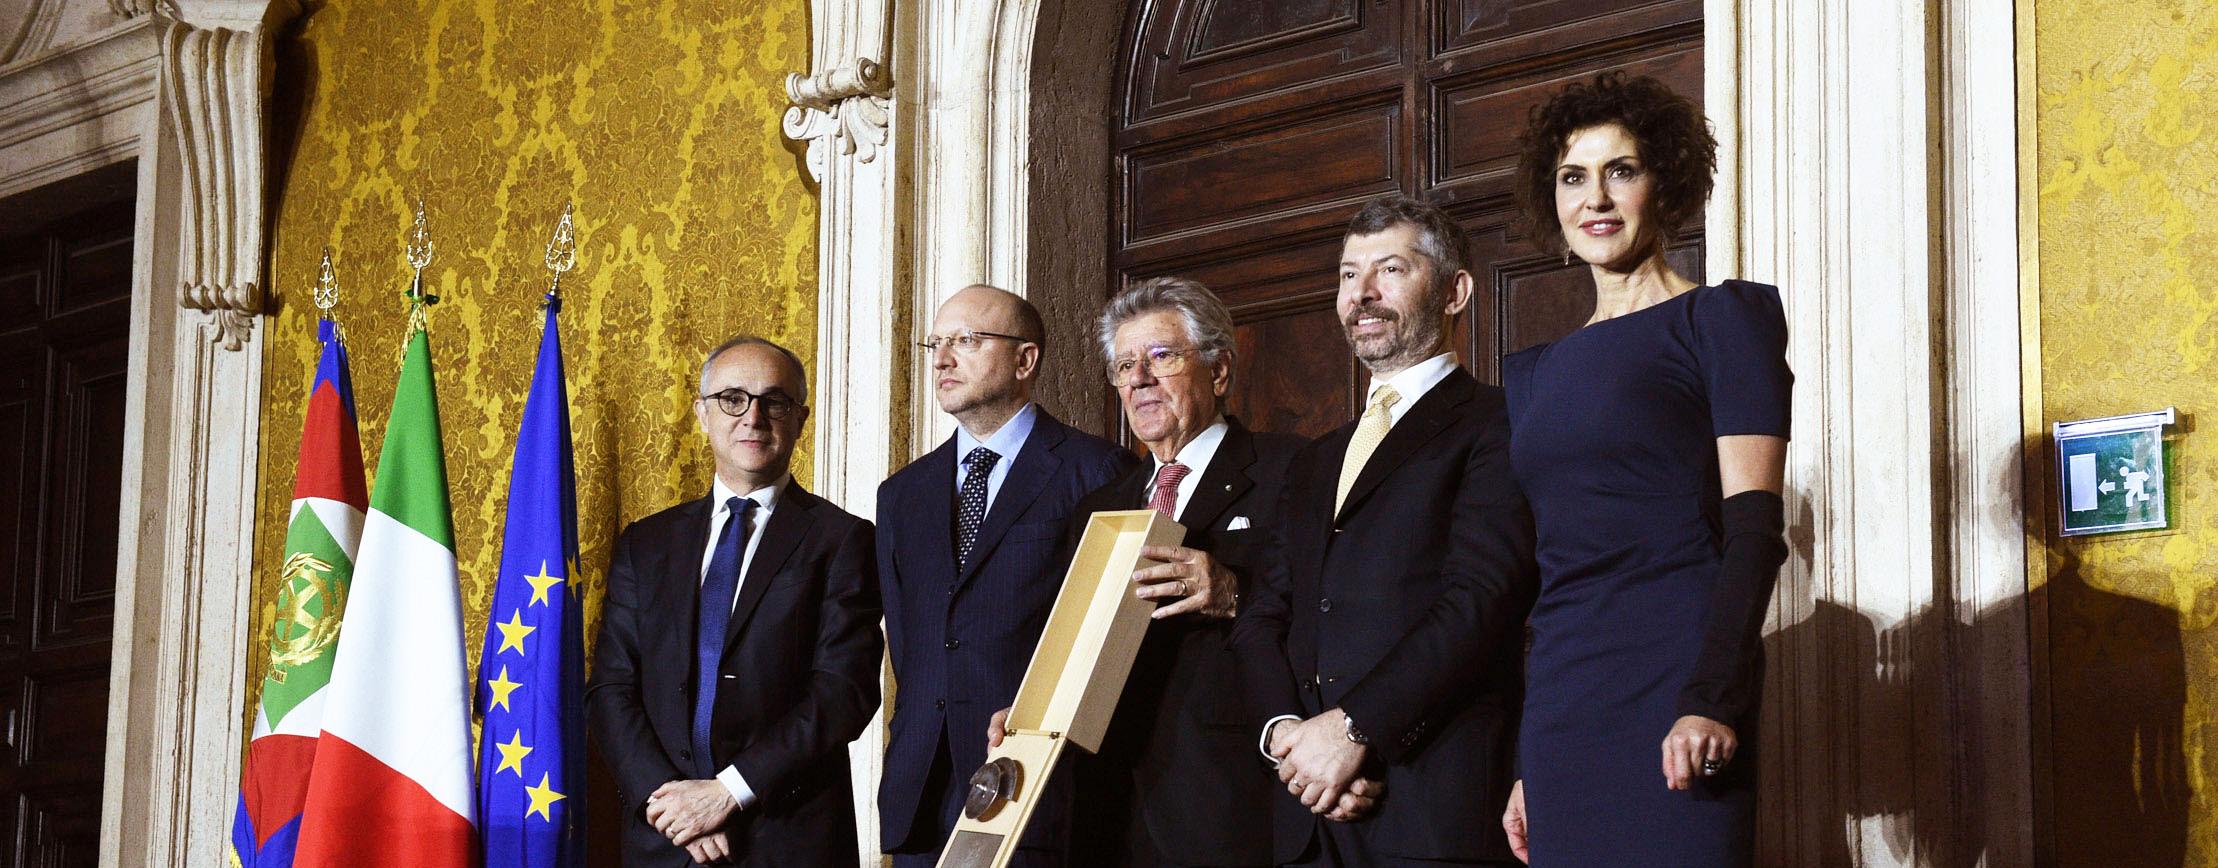 The entrepreneur who promotes Italian excellence